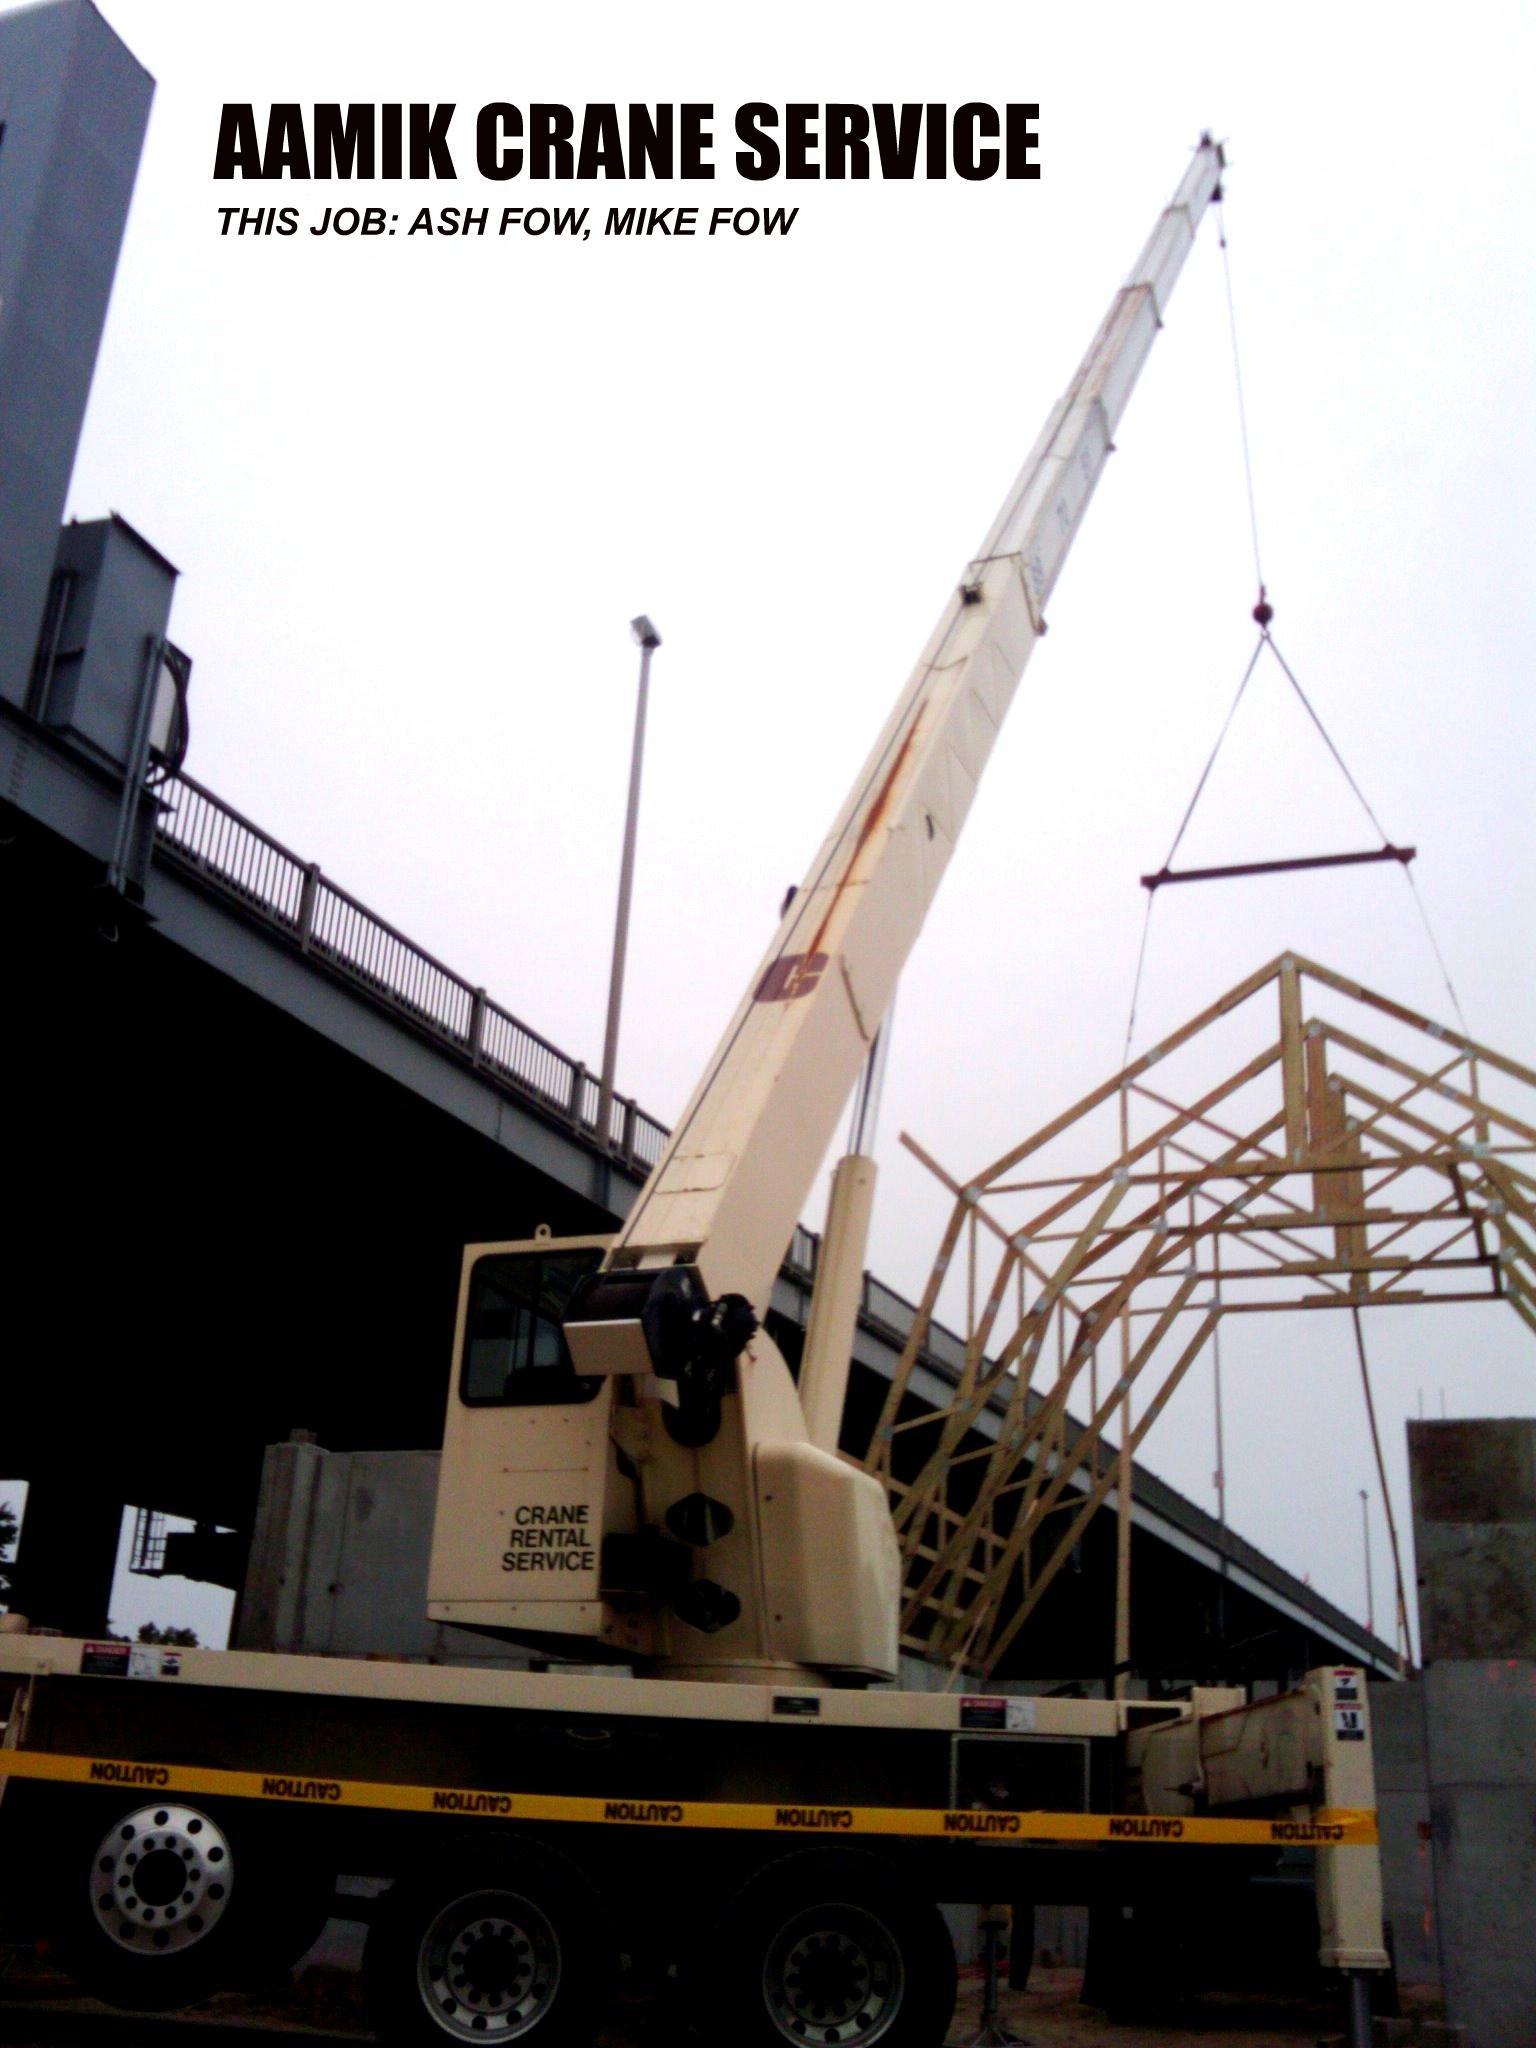 Aamik Crane Service image 3